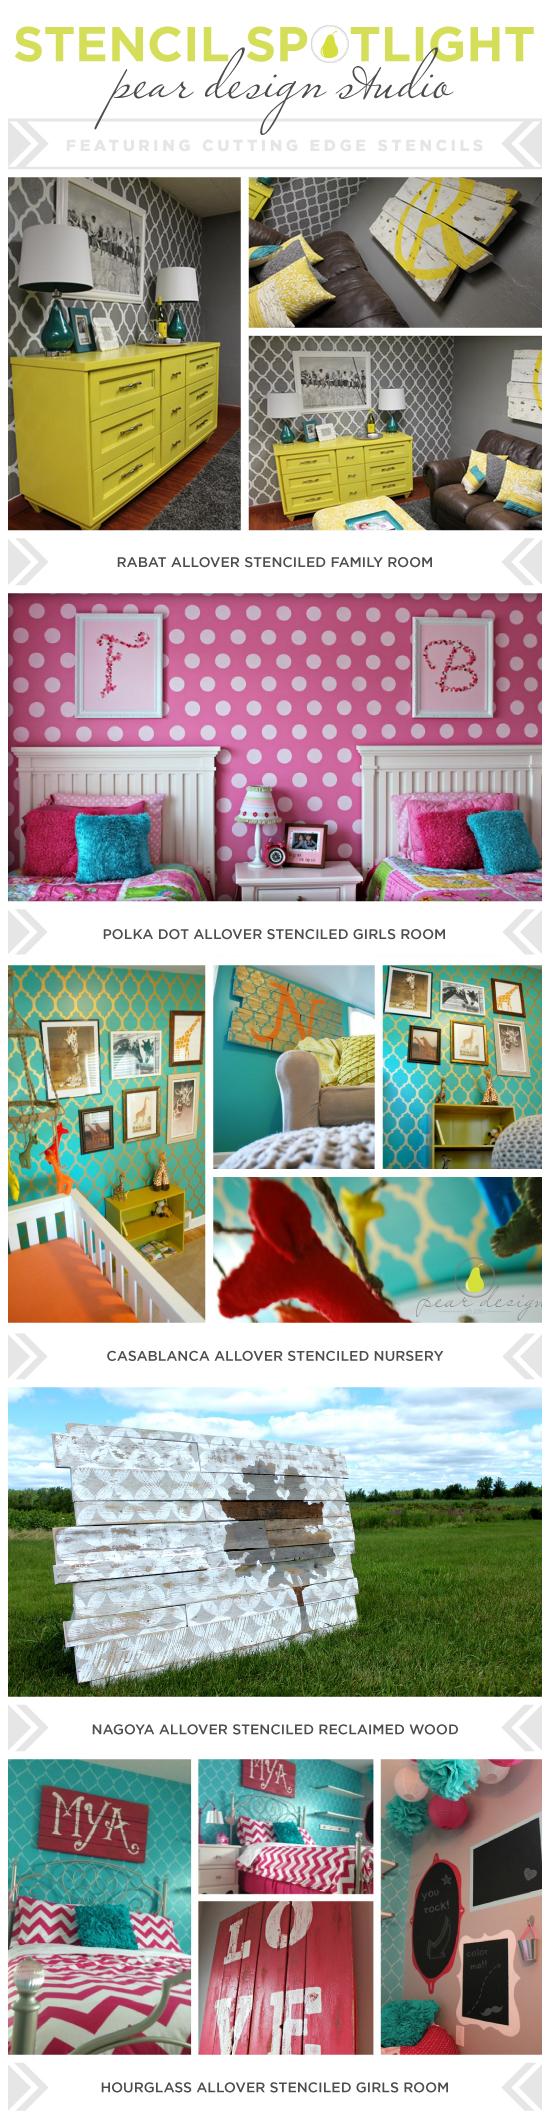 Cutting Edge Stencils shares DIY stenciled room ideas from Pear Design Studio. http://www.cuttingedgestencils.com/wall-stencils-stencil-designs.html